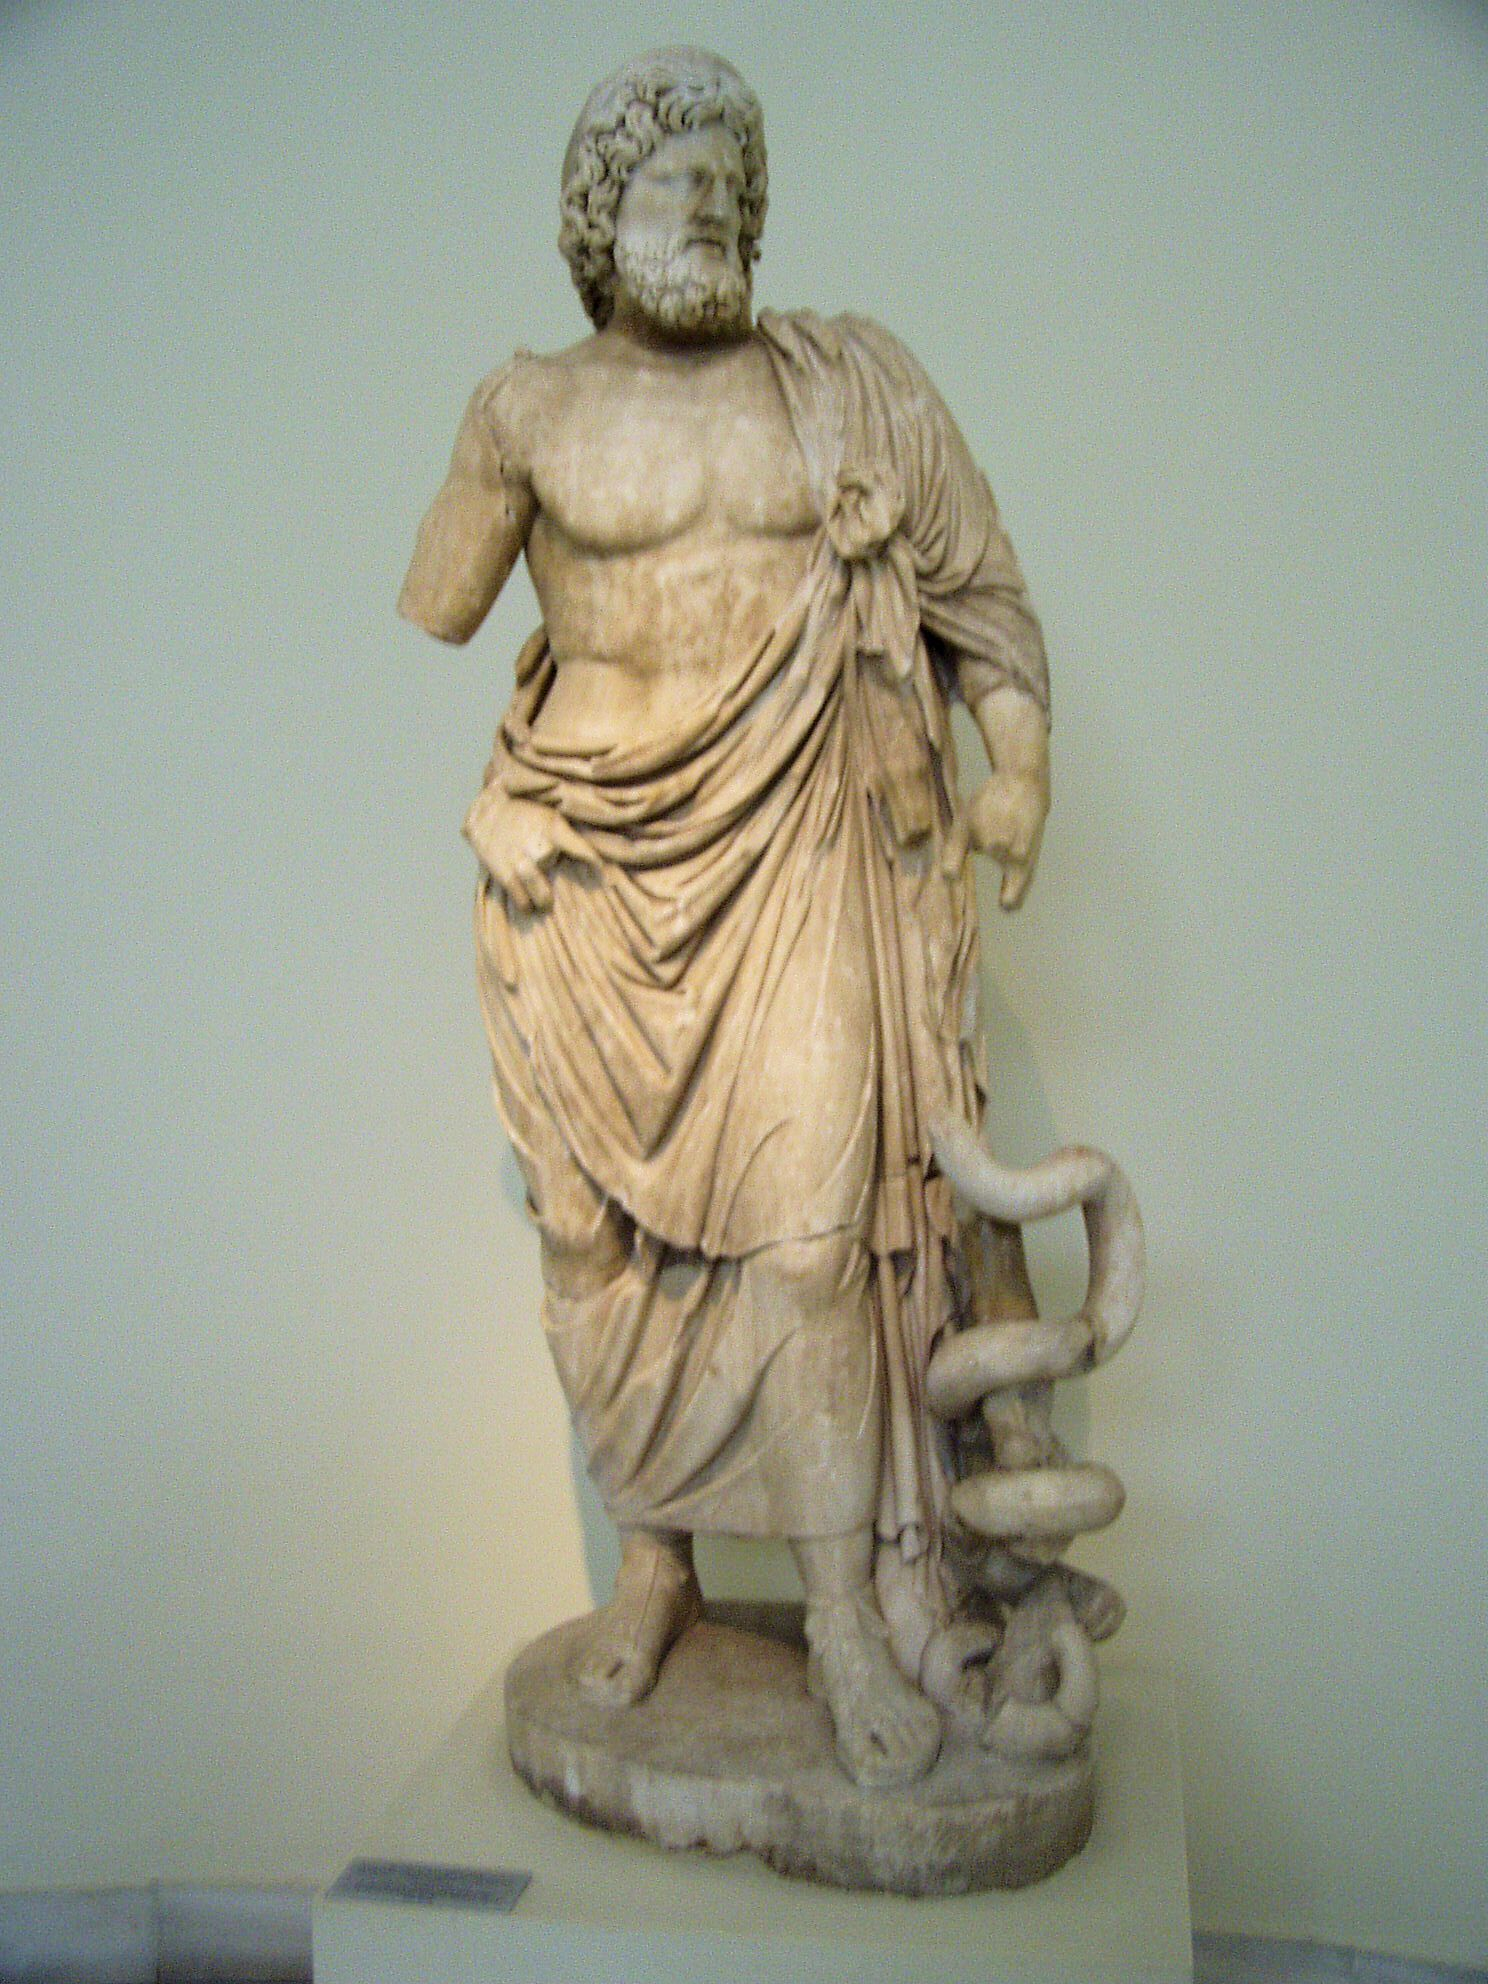 Greek mythology gods sculpture statue of asclepius the greek greek mythology gods sculpture statue of asclepius the greek god of medicine from buycottarizona Gallery